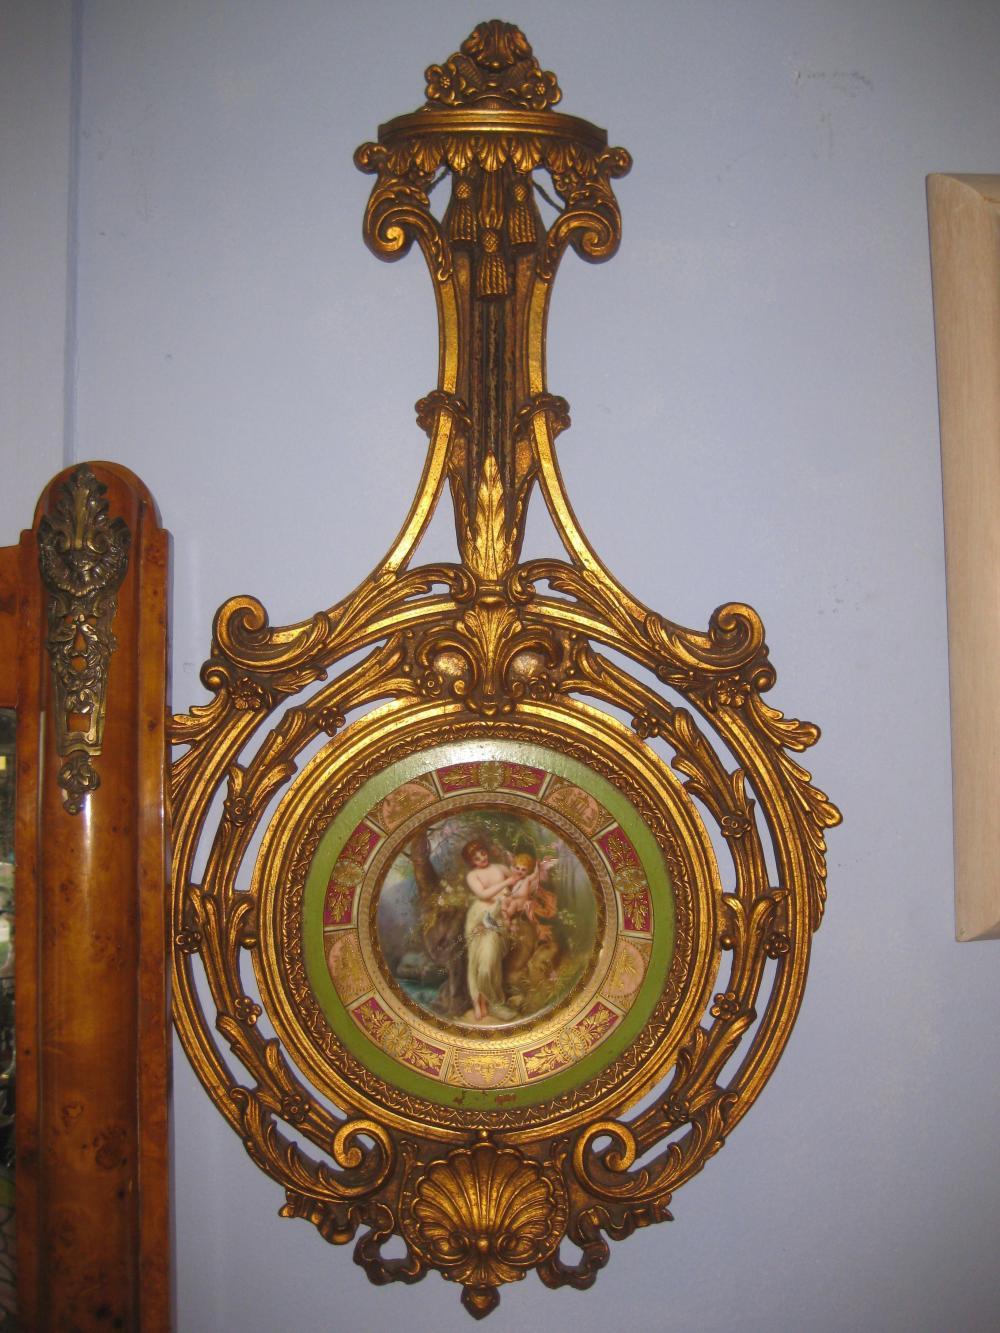 Royal Vienna porcelain plate, Ackerman & Fritze 19th c